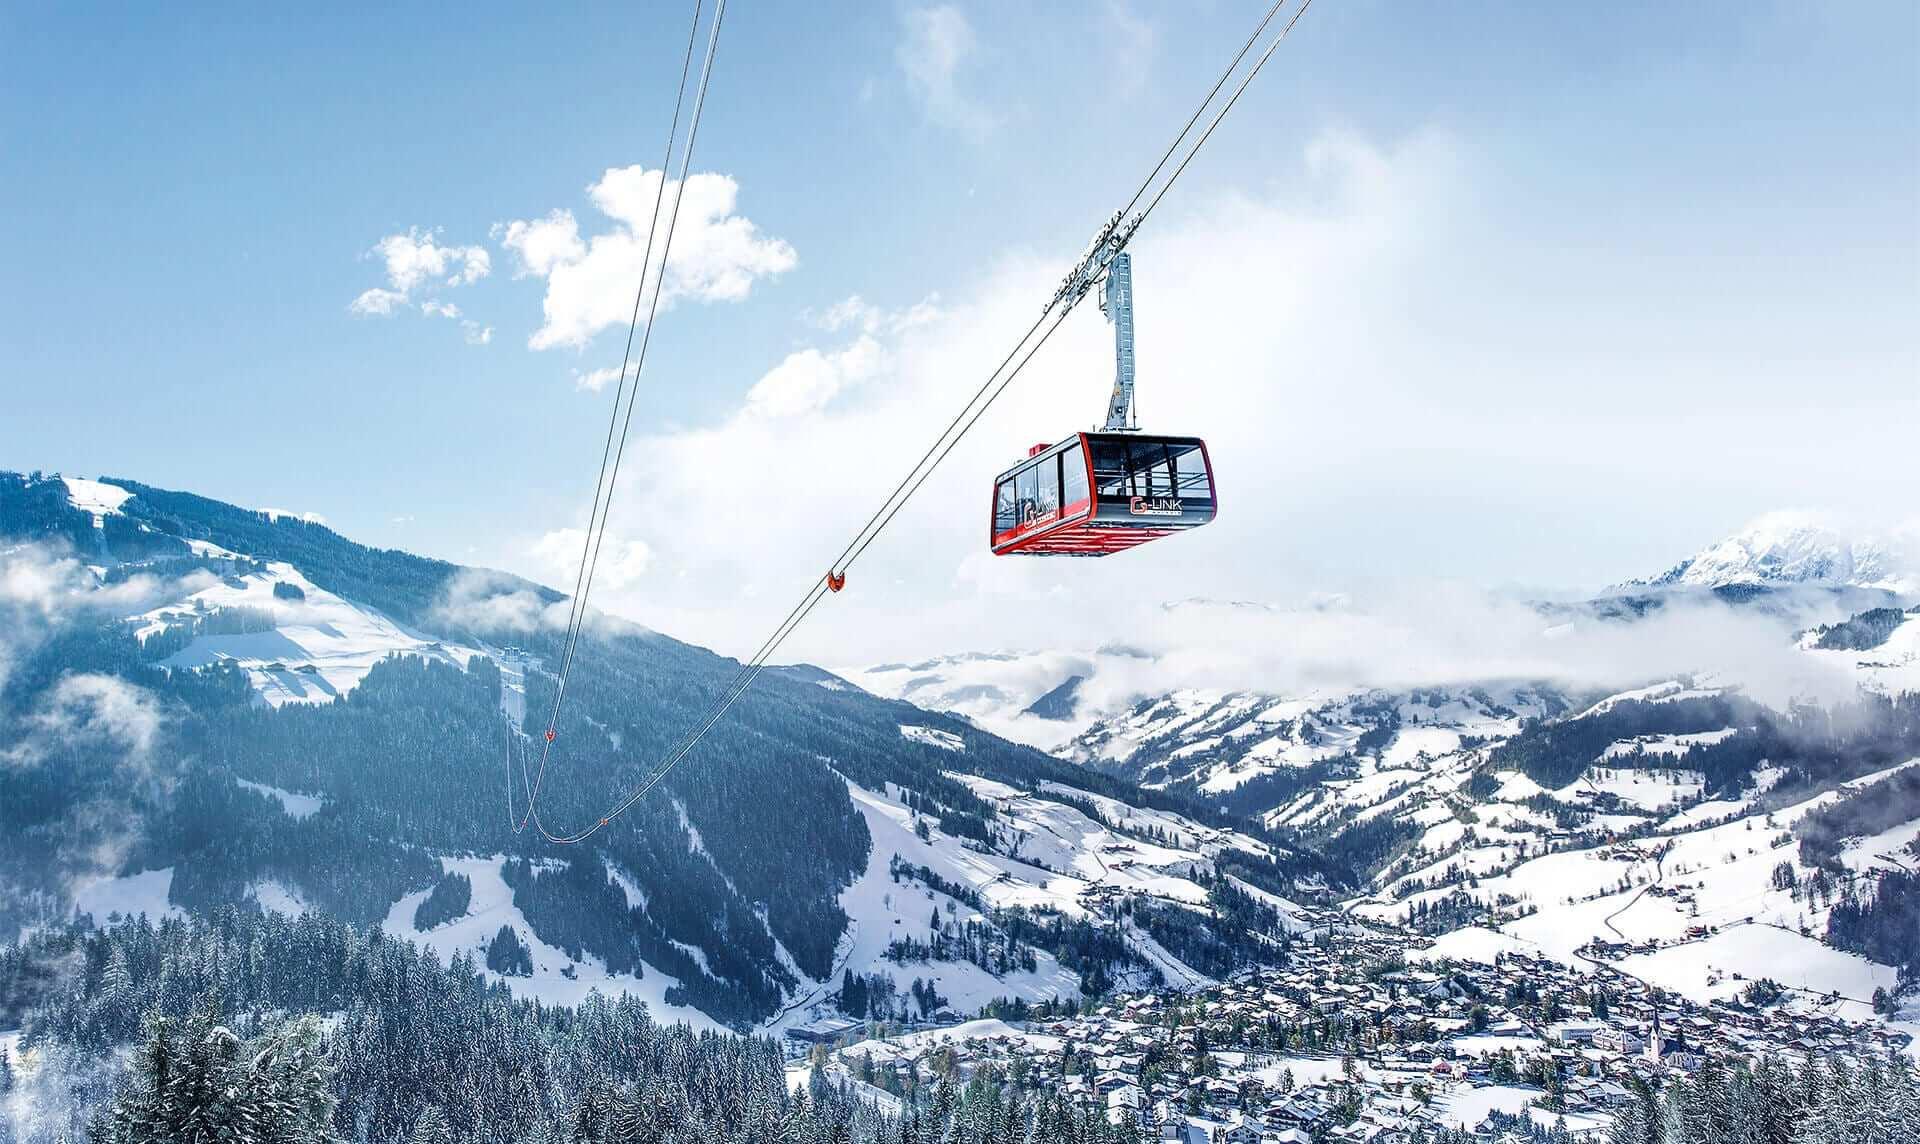 Skiurlaub im Snow Space Salzburg mit Wagrain, Flachau & St. Johann/Alpendorf